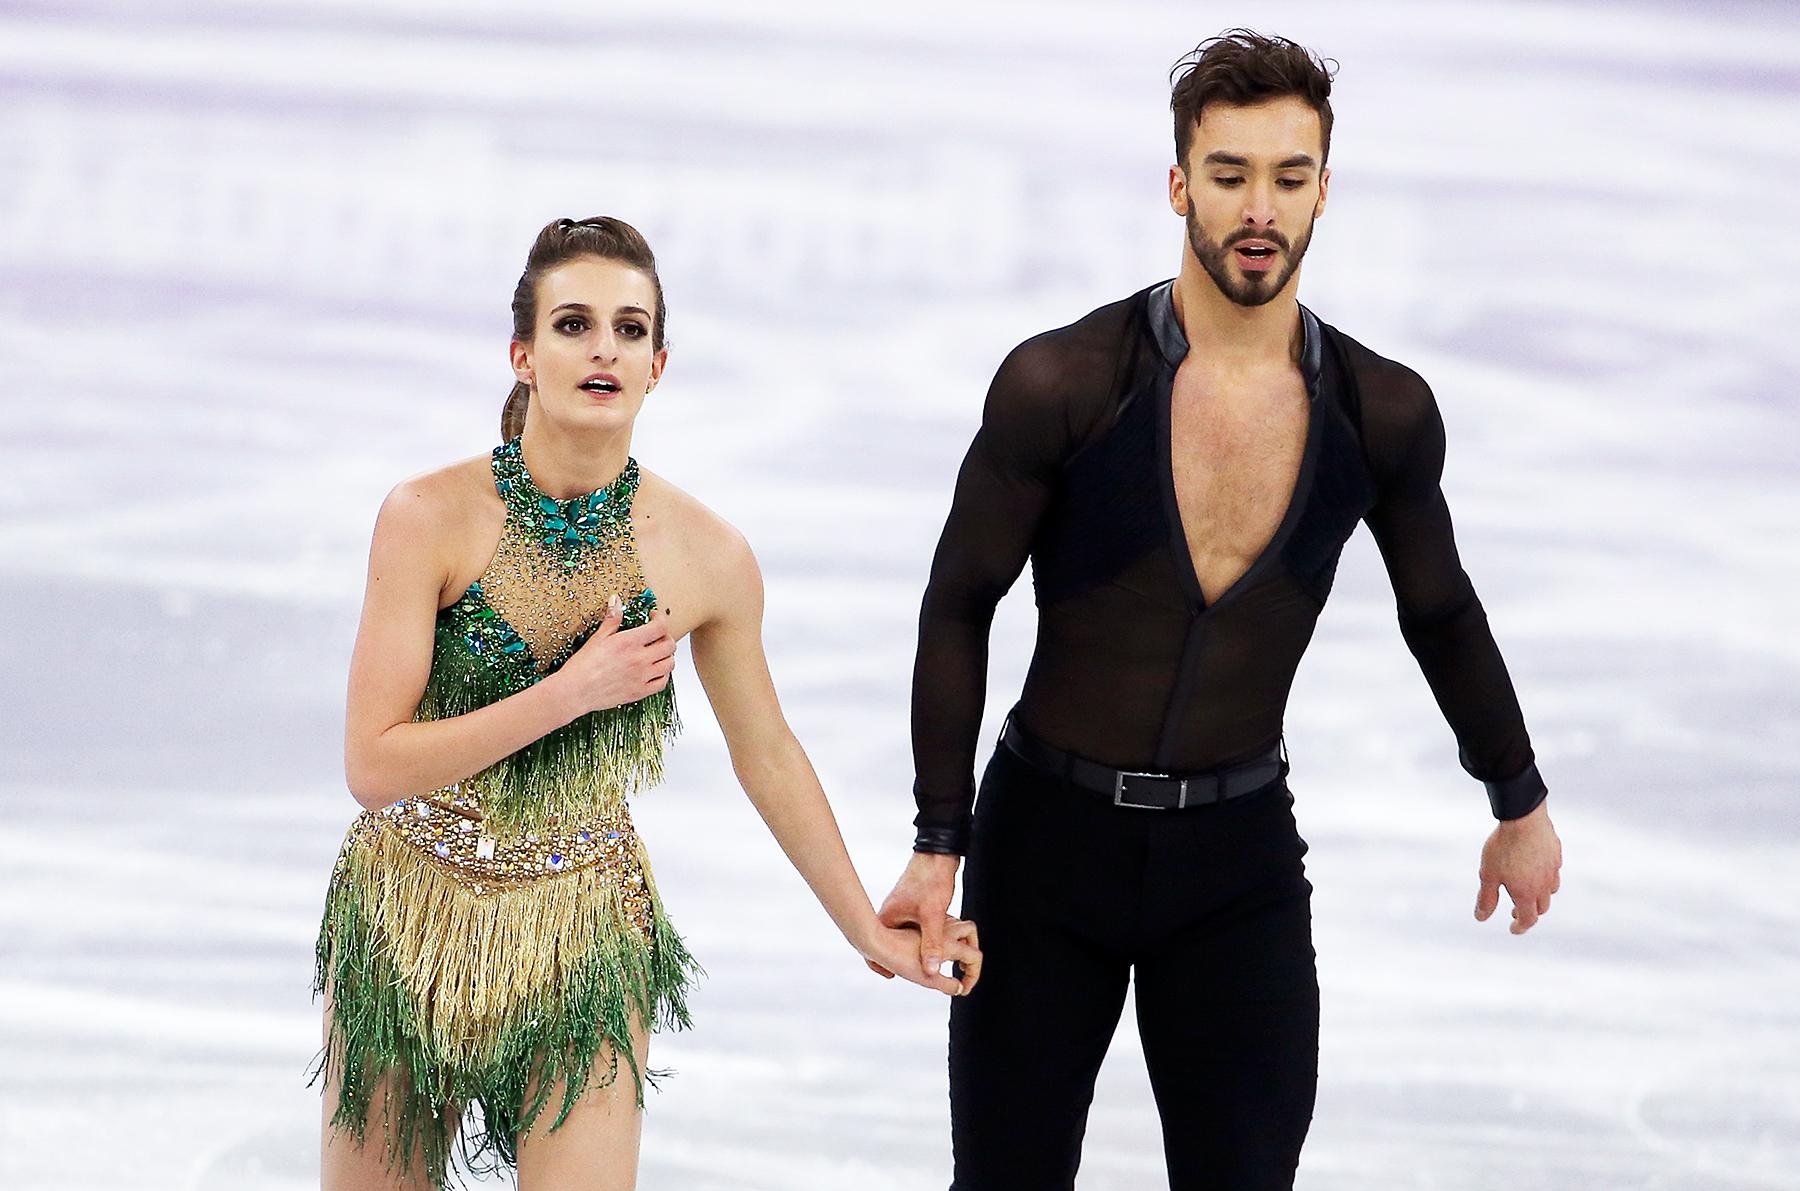 Olympic Malfunction